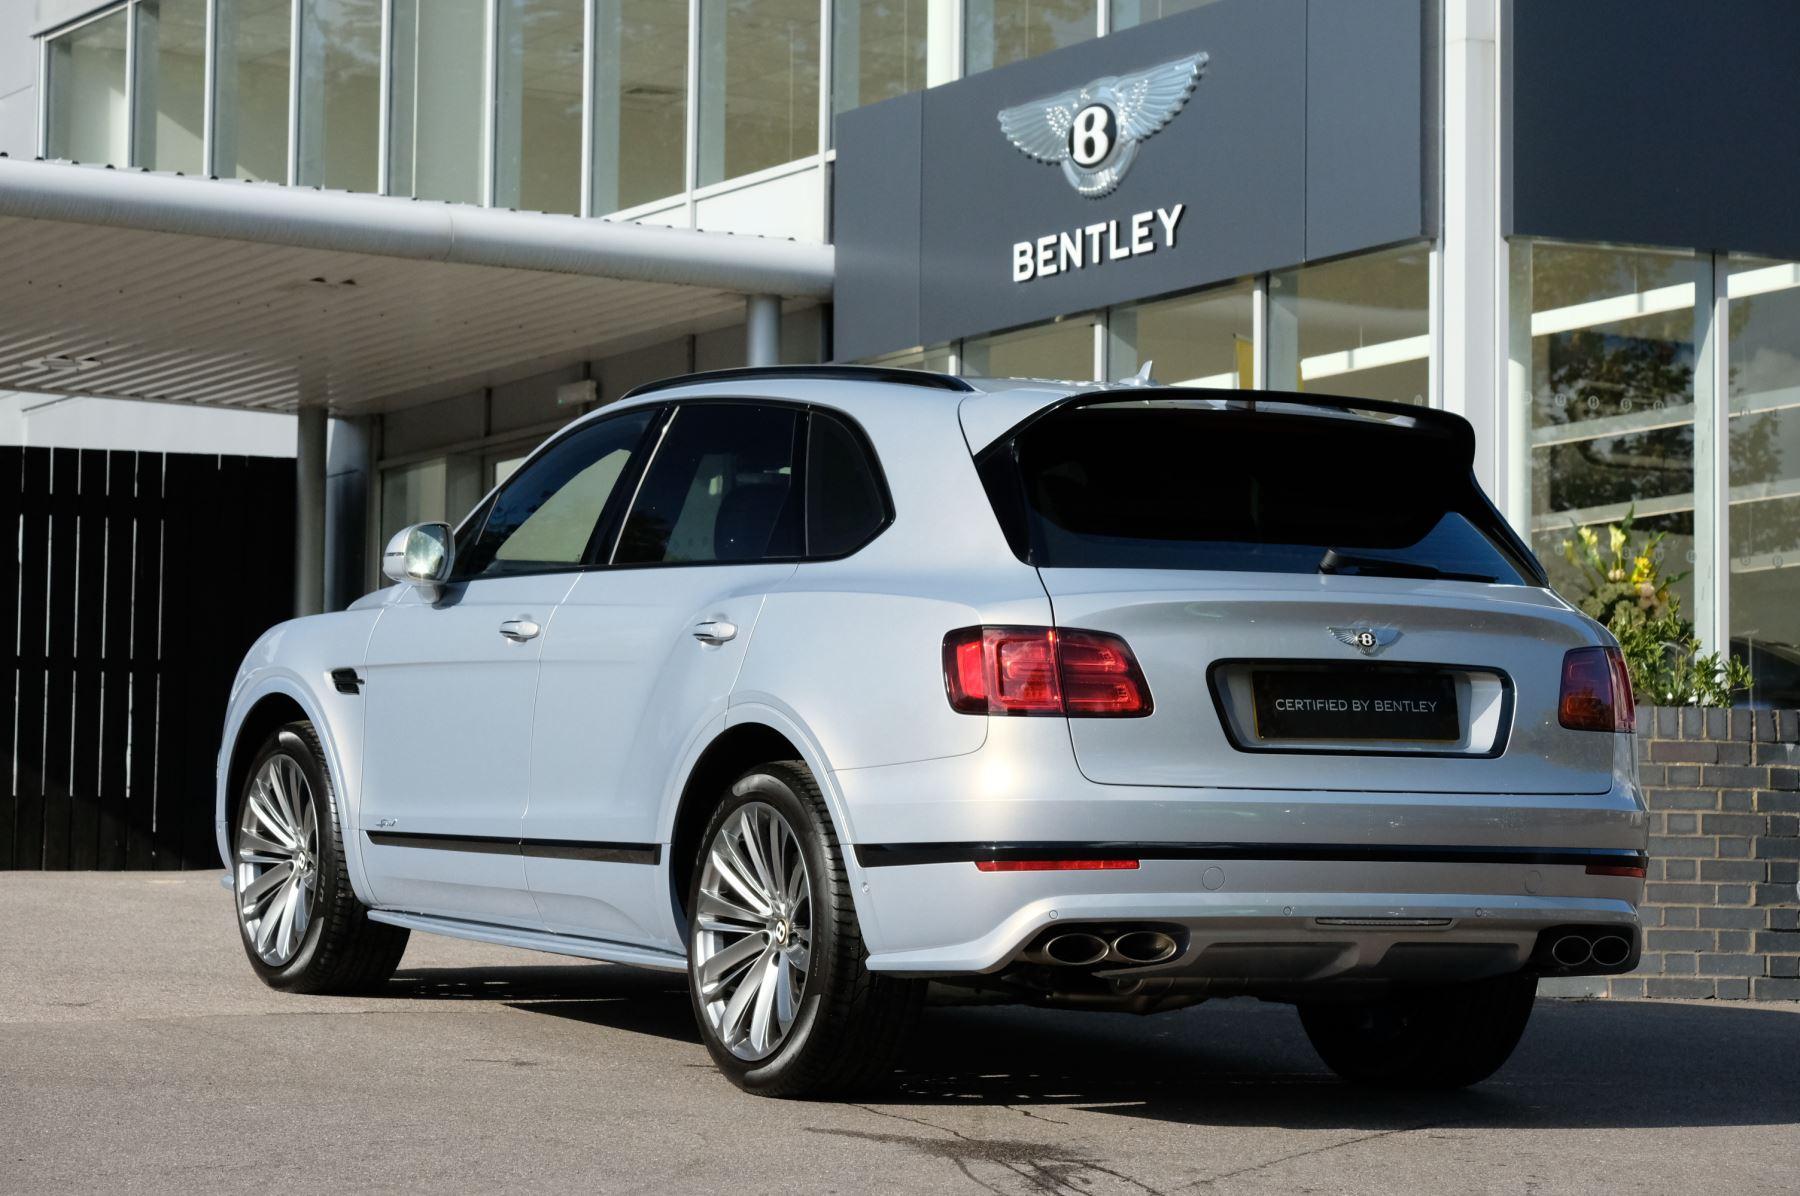 Bentley Bentayga Speed - City & Touring image 5